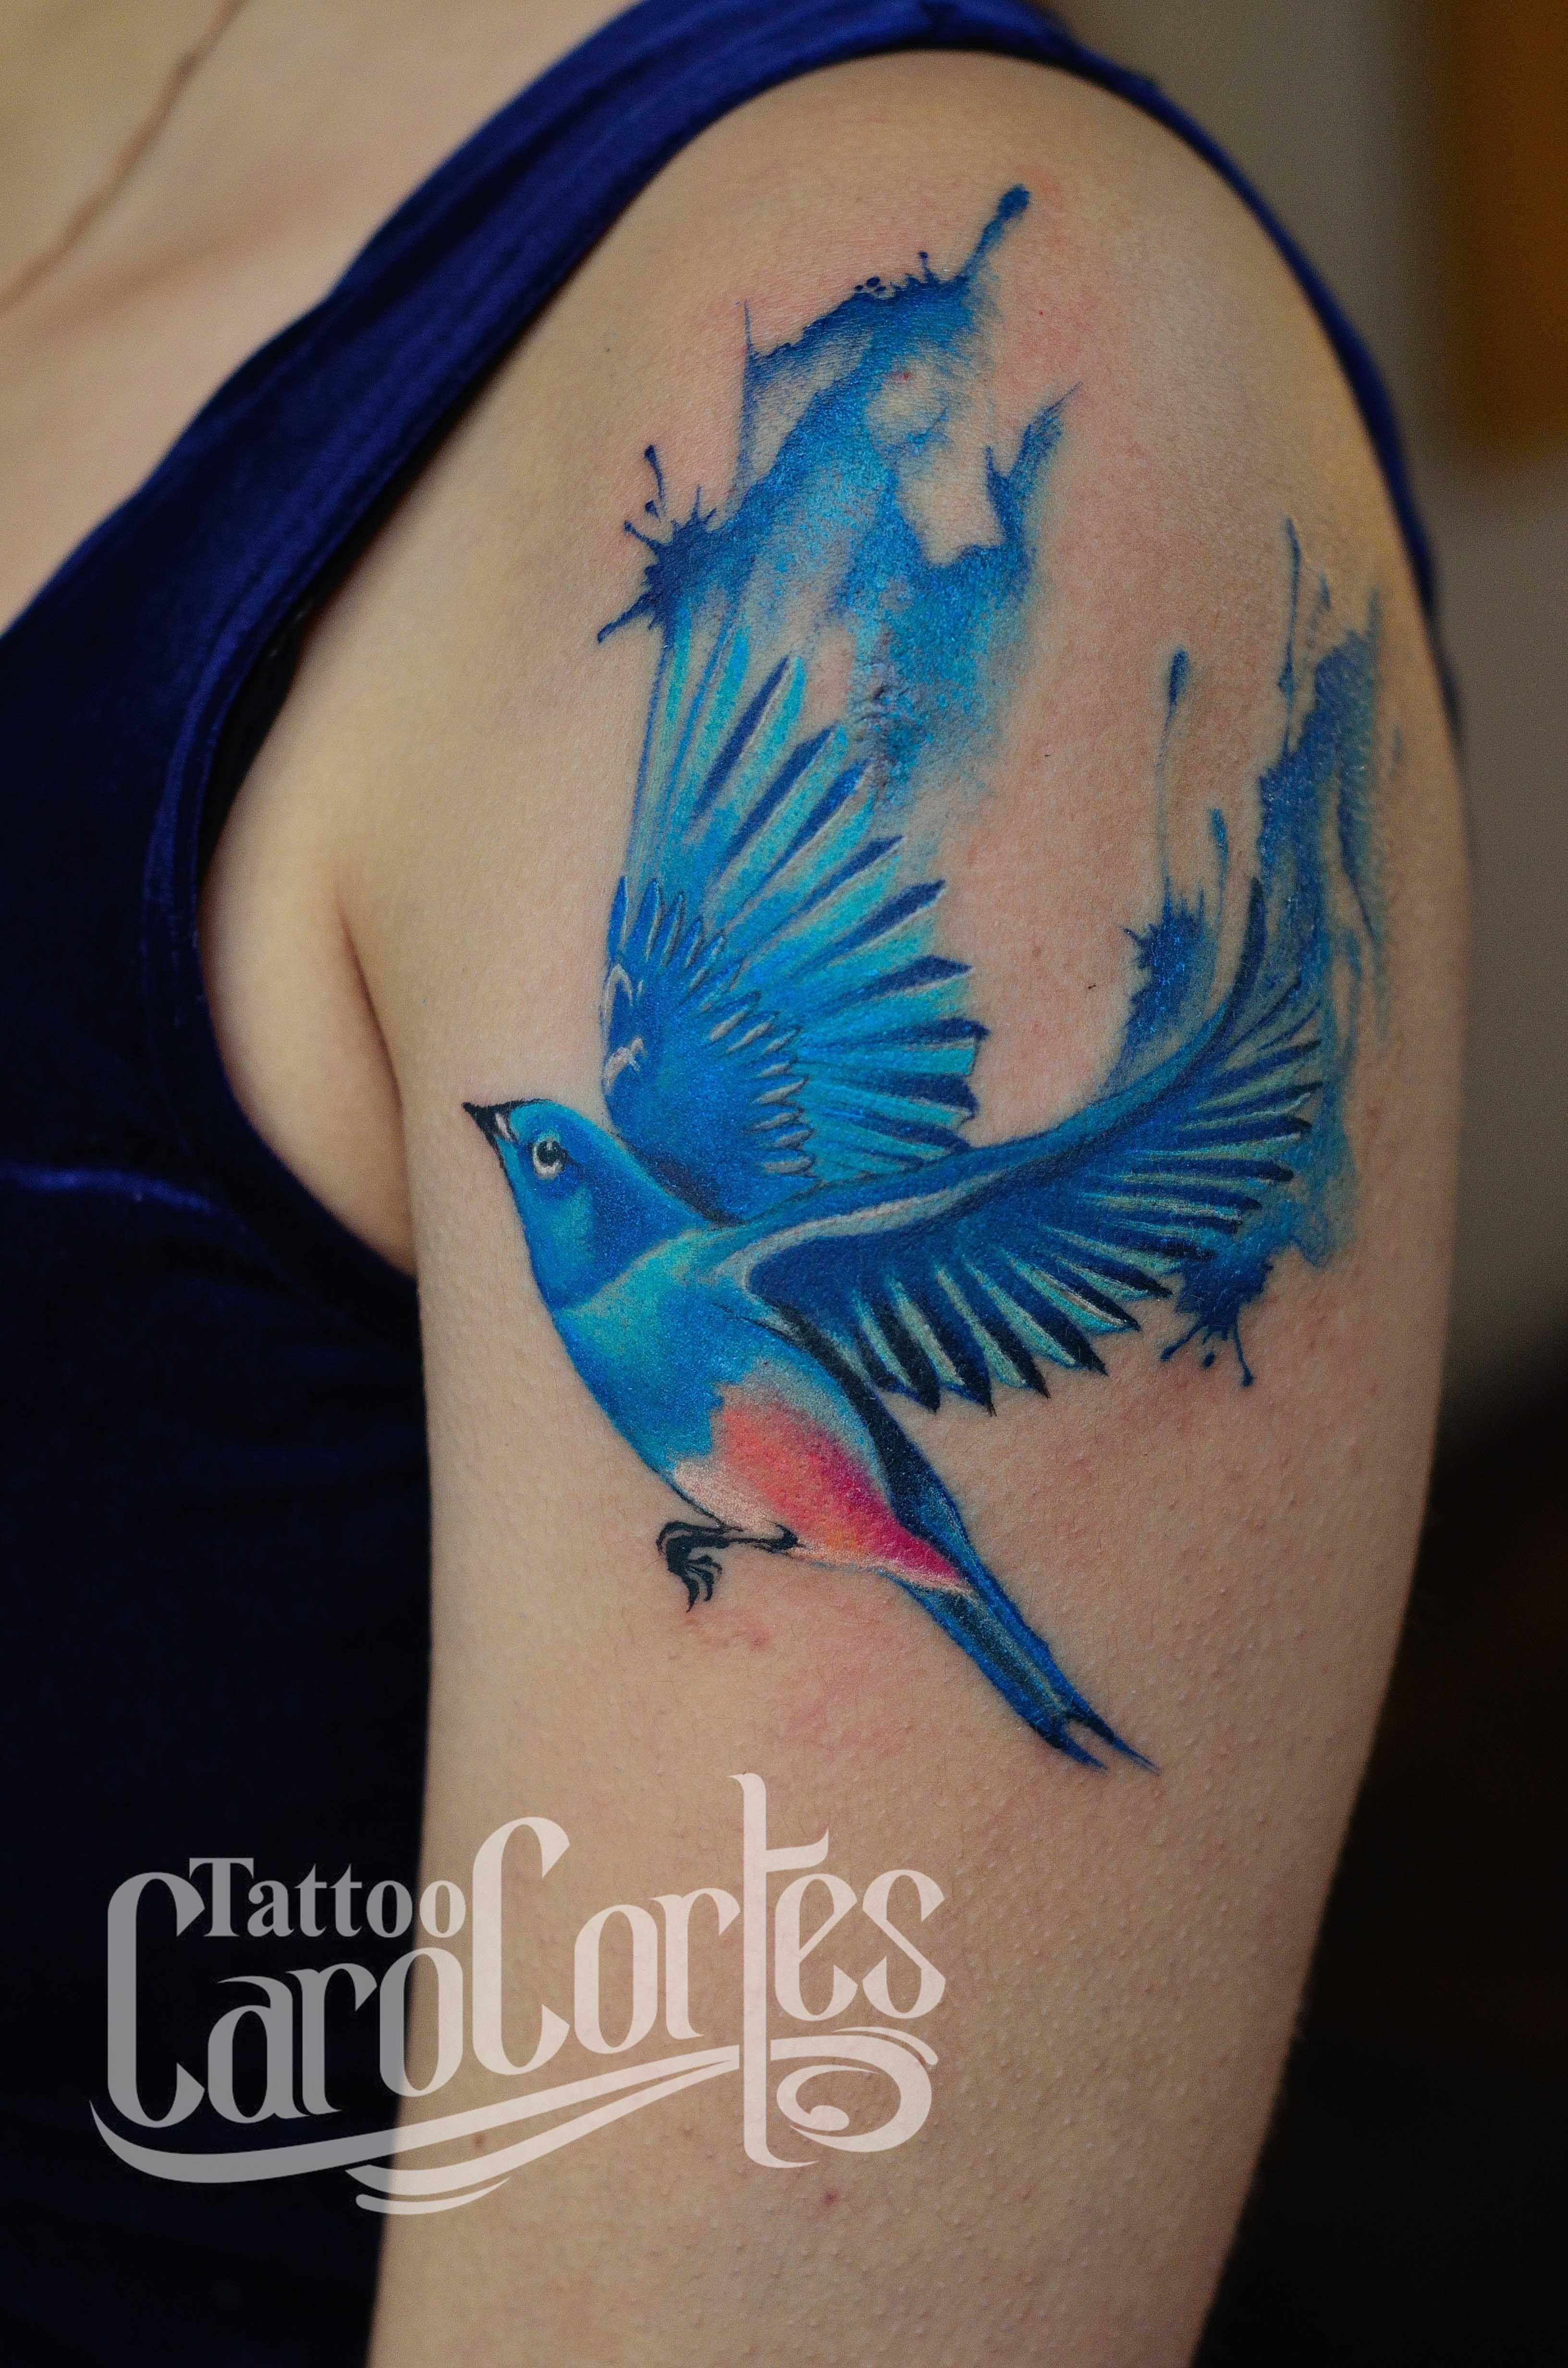 Watercolor tattoo artists in houston texas - European Bee Eater Watercolor Azulejo Y Acuarela Caro Cortes Colombian Tattoo Artist